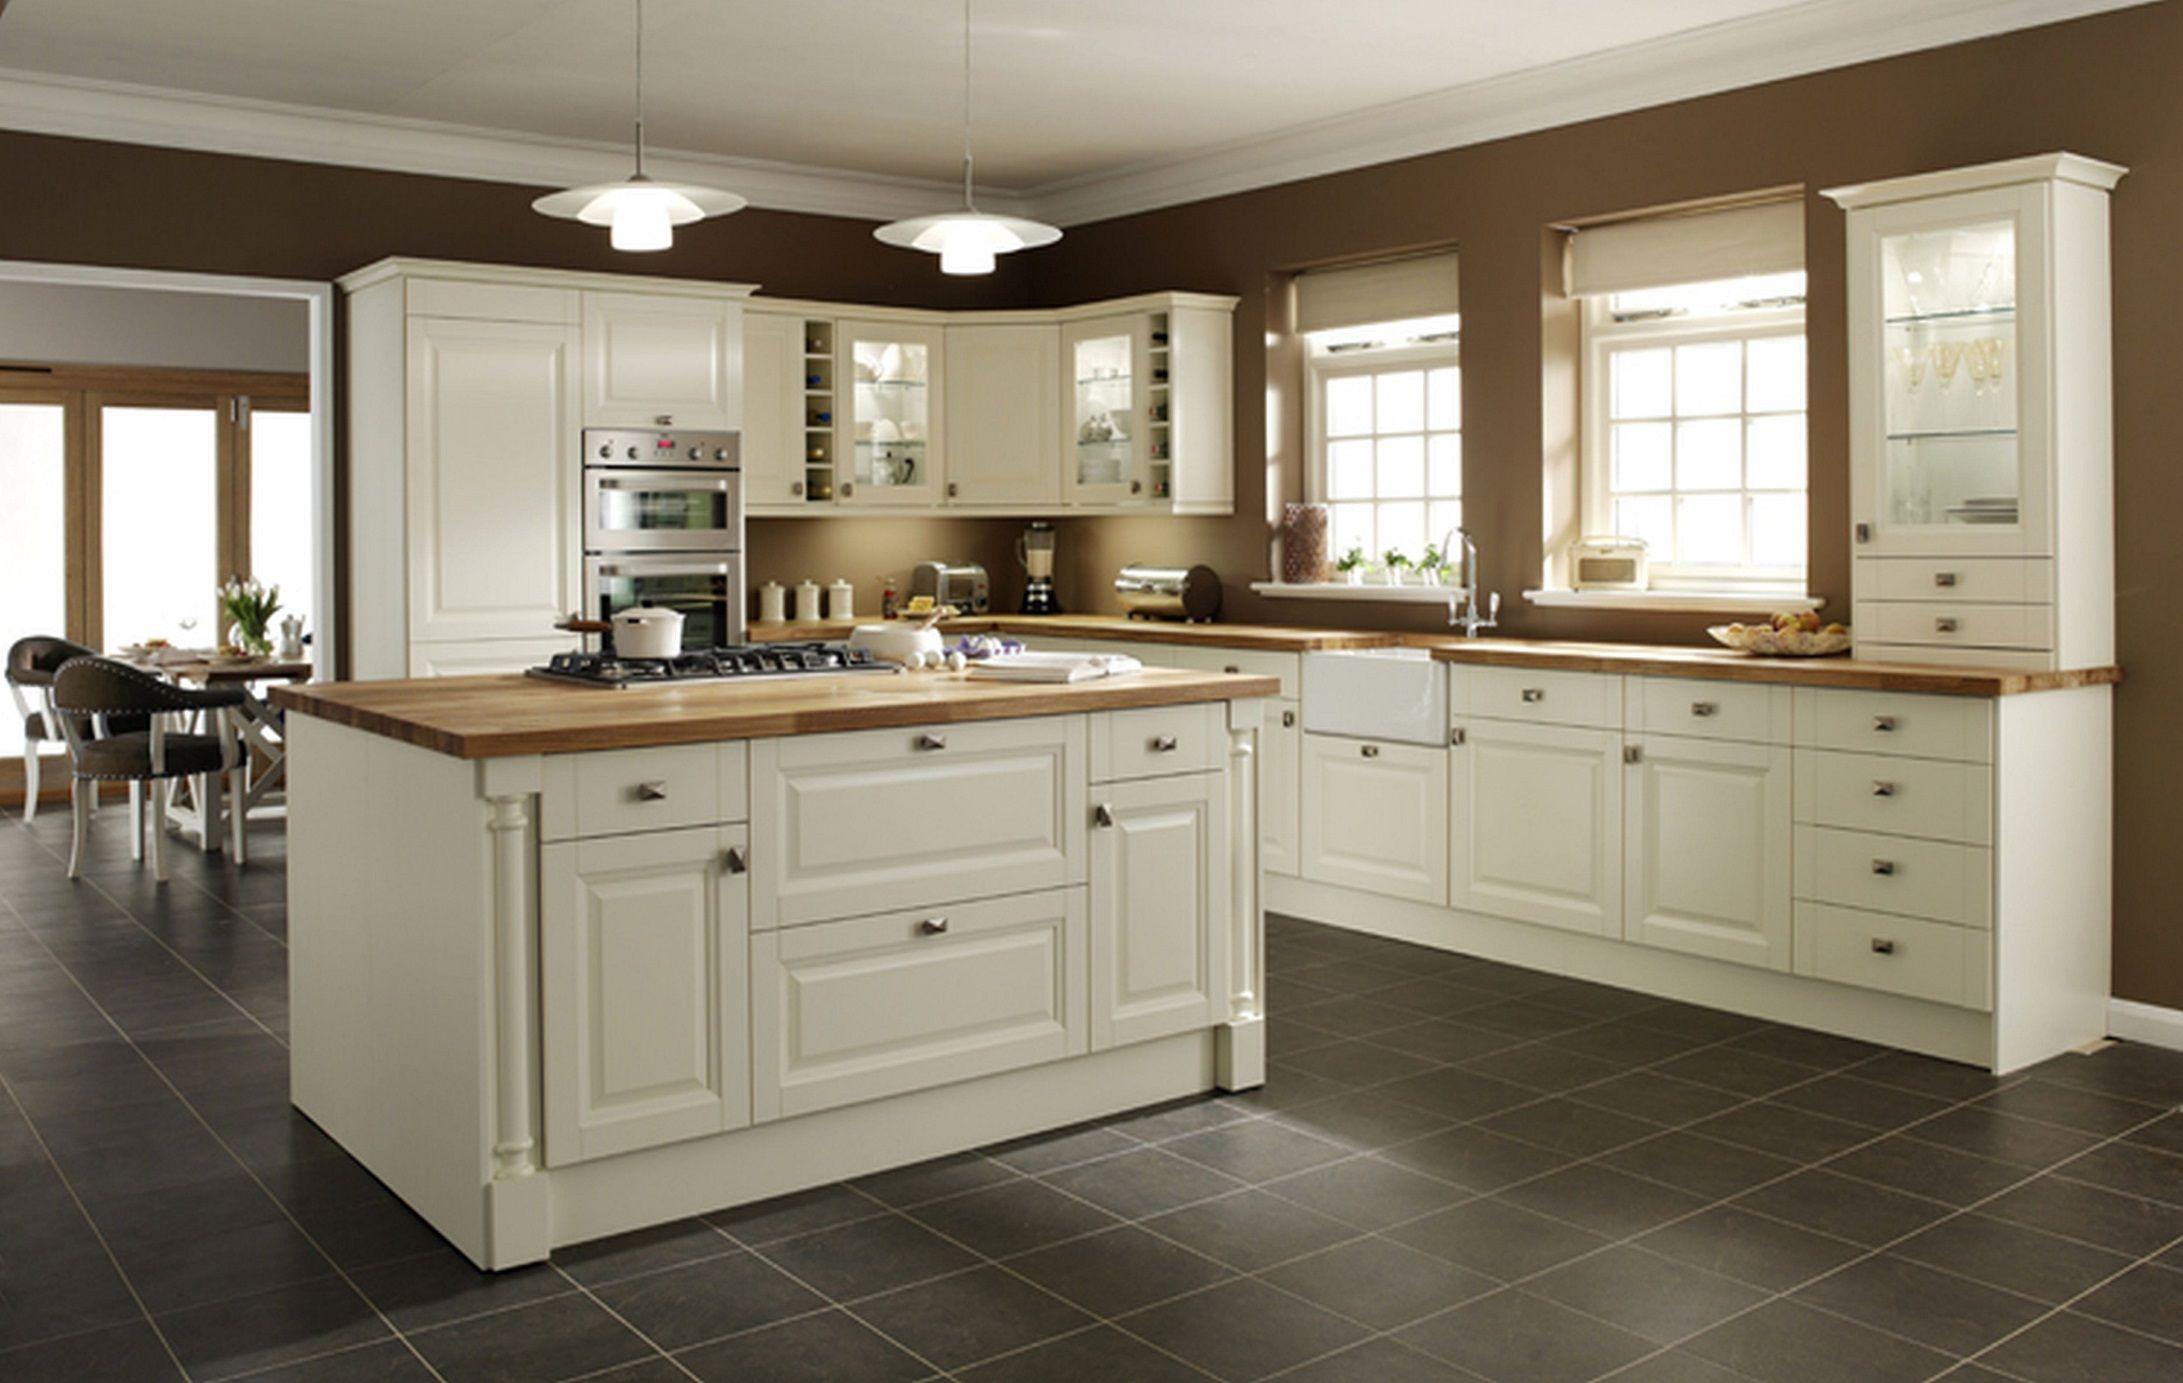 Dark Floors Cream Cabinets With Oak Wood Cream Kitchen Cabinets Kitchen Cabinet Design Best Kitchen Cabinets